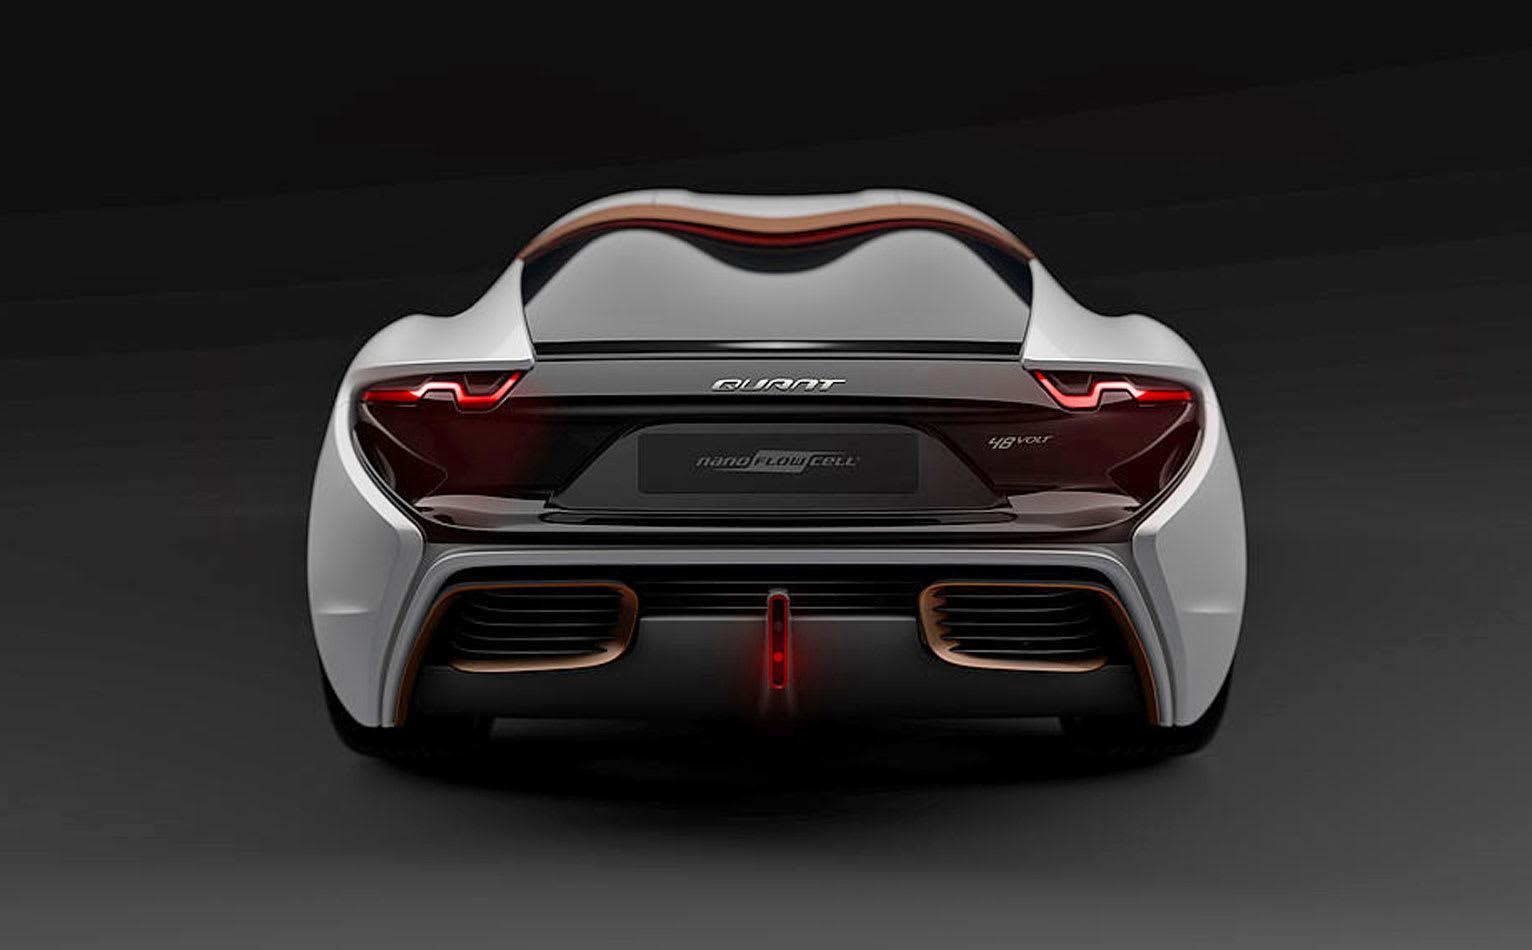 Supercar concept runs on electrolyte fluids